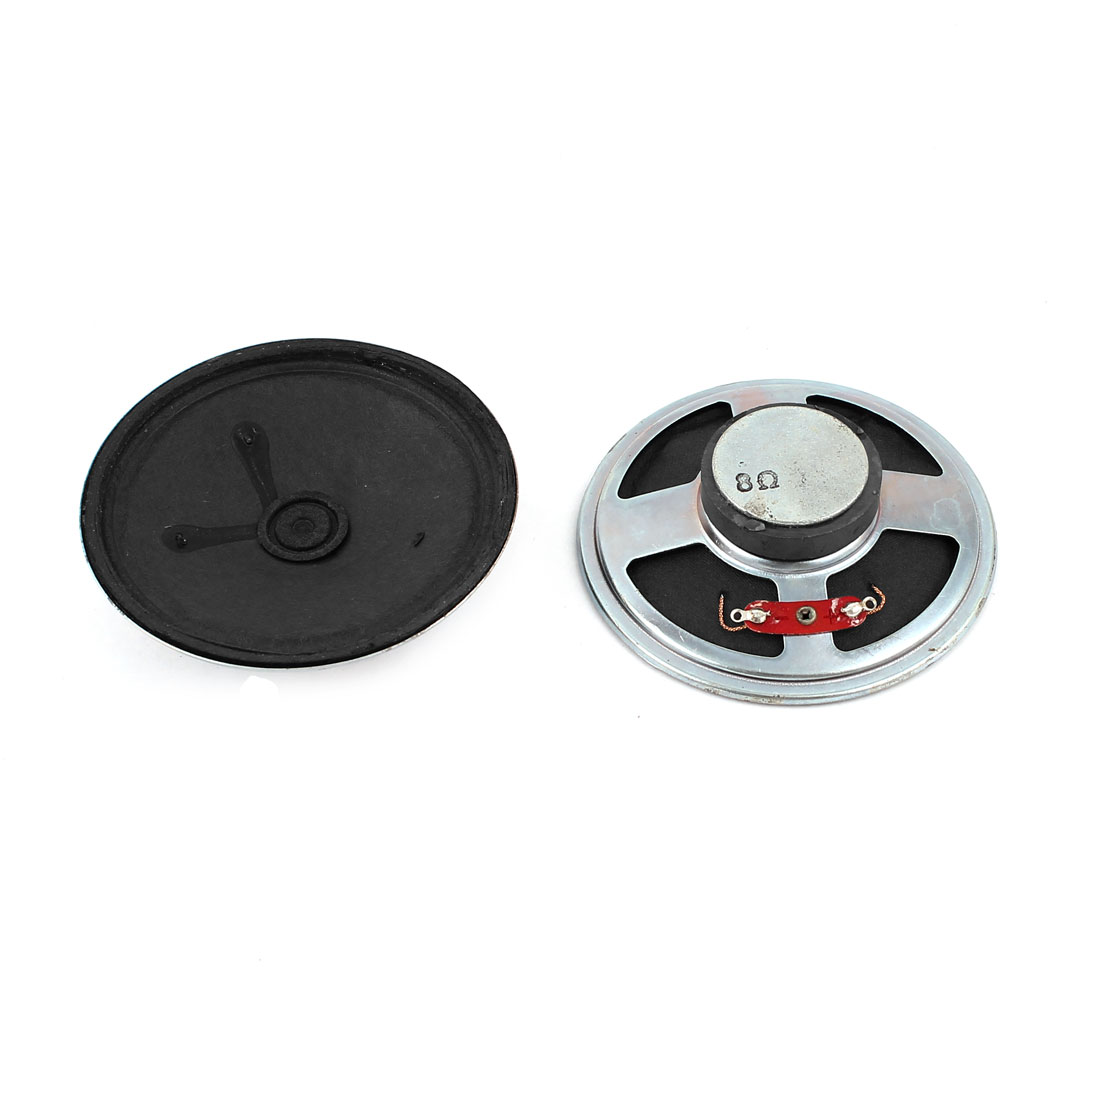 2 Pcs 77mm Dia Silver Tone Round External Magnet Speaker Loudspeaker 8 Ohm 1W